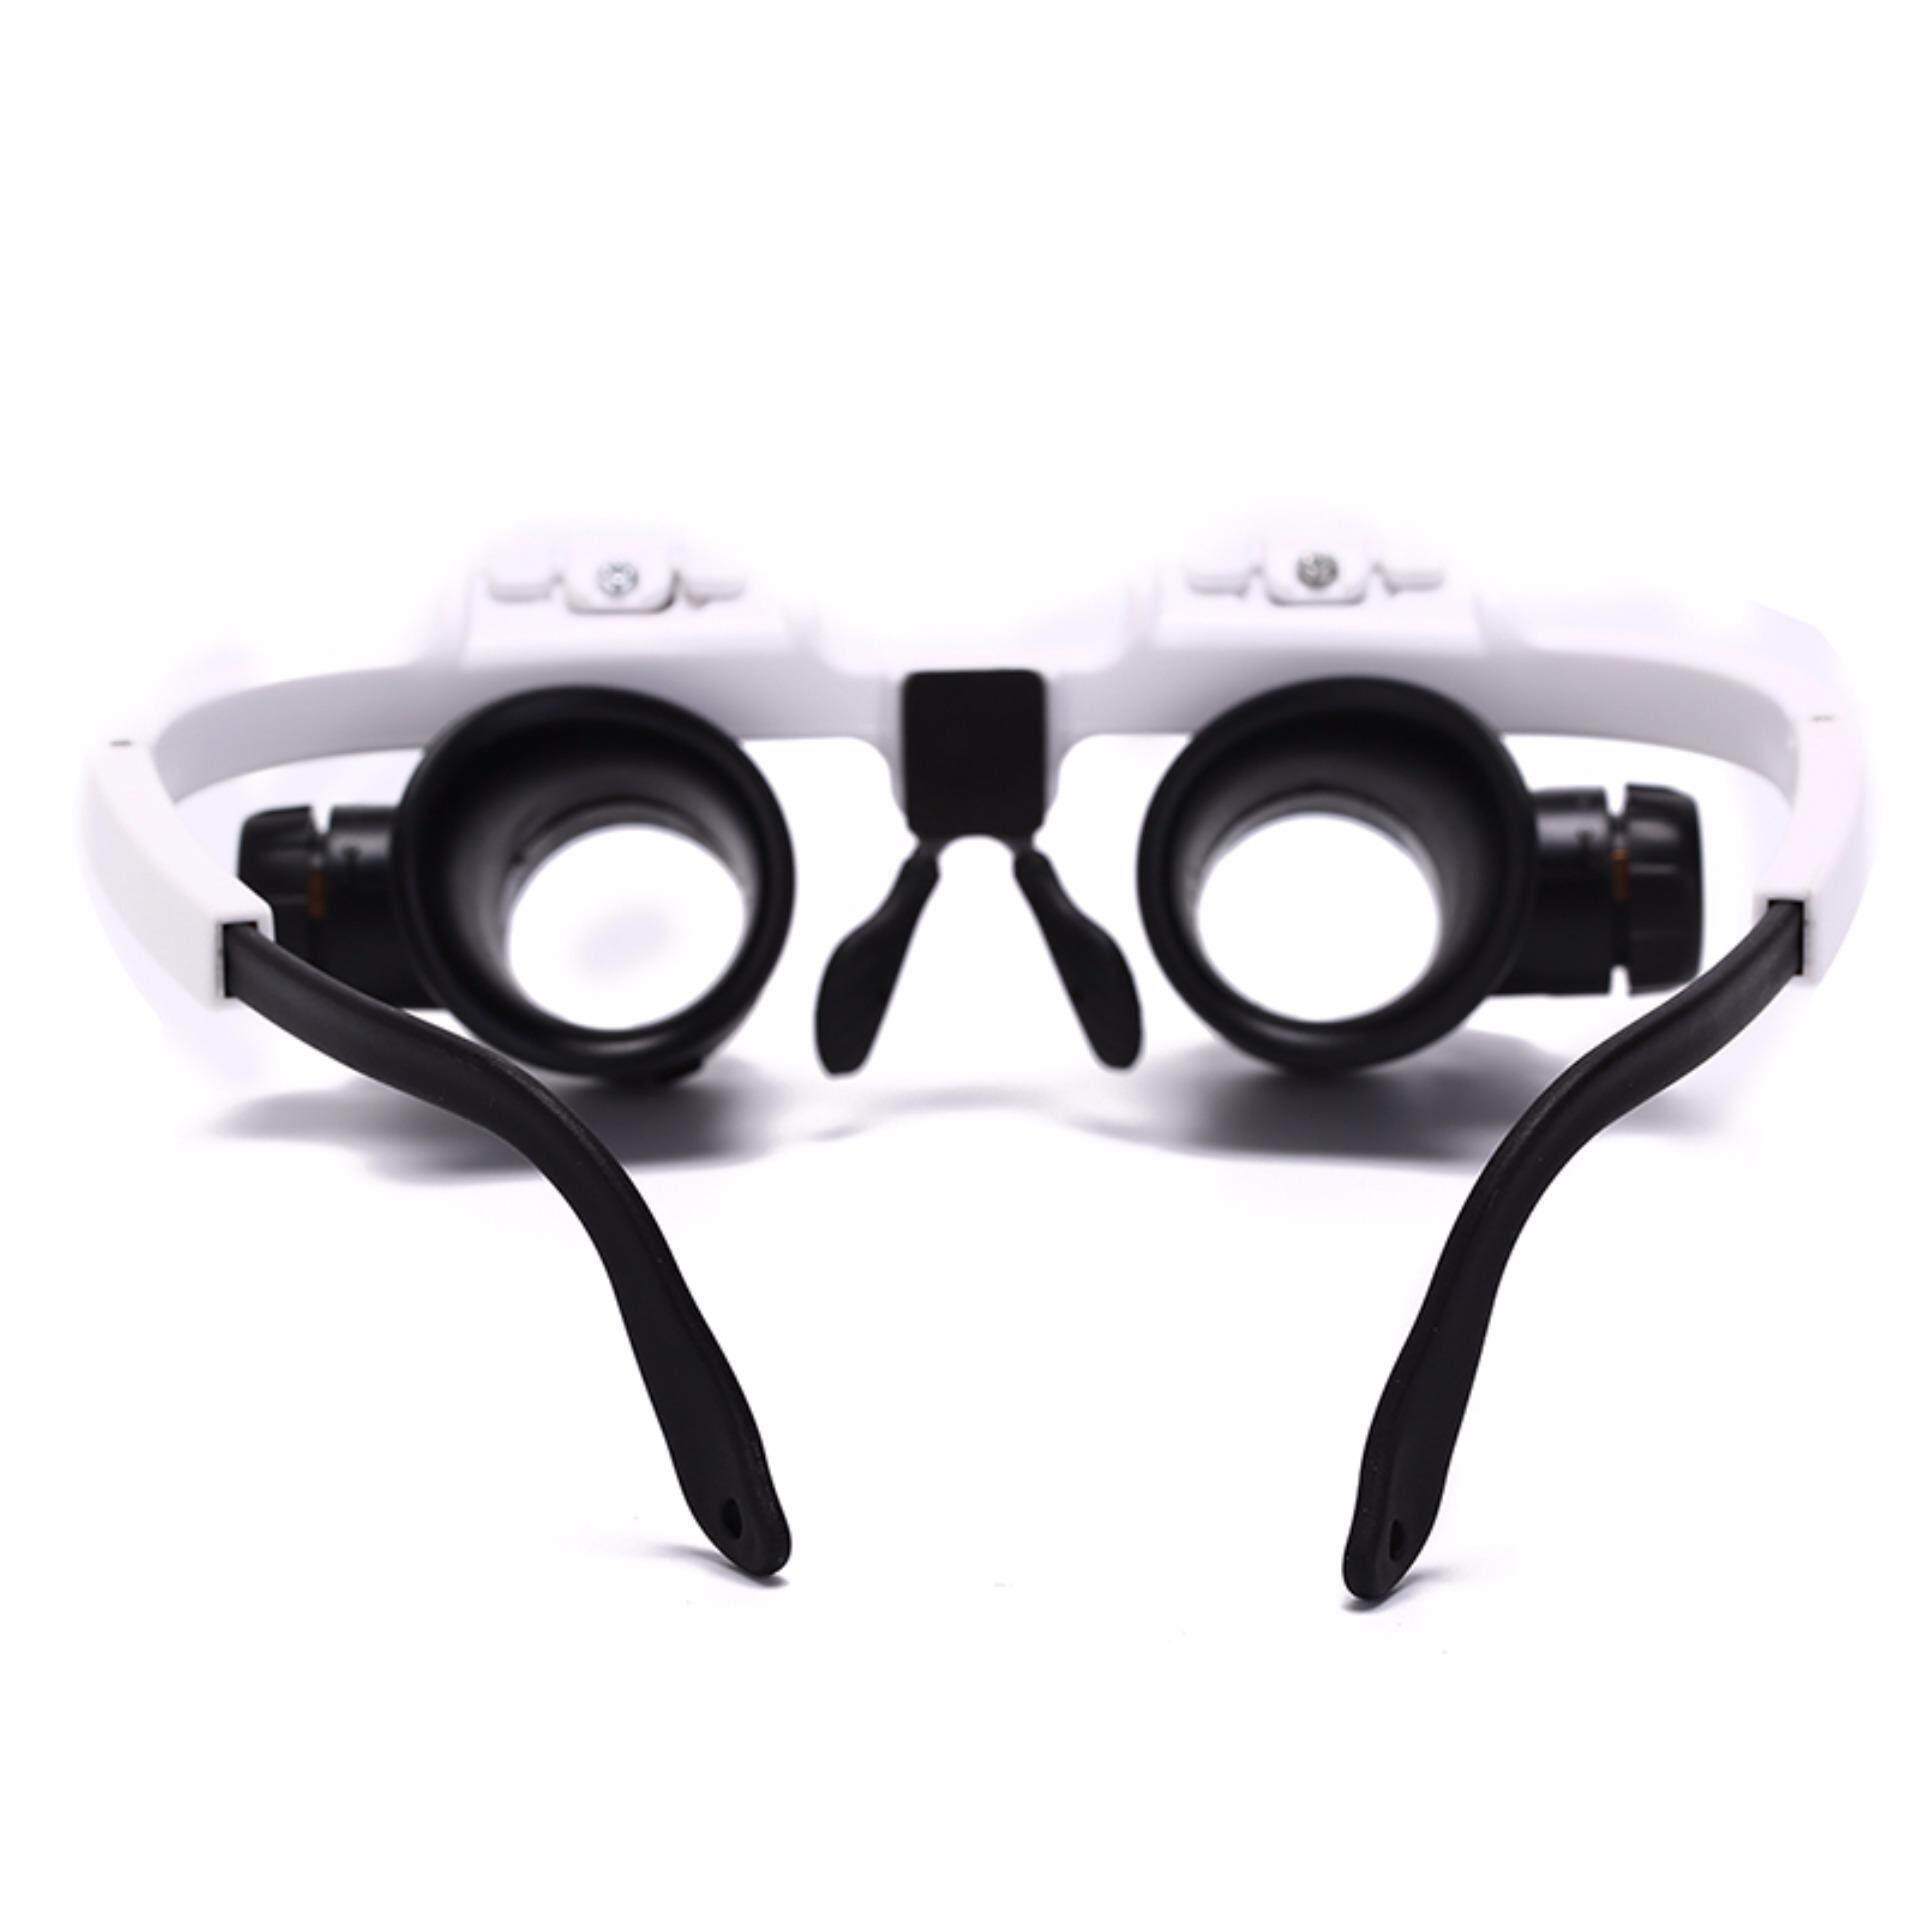 Female Warrior 8x 15x 23x Adjustable Bracket Loupe Led Light Headband Magnifier Glass With Lamp